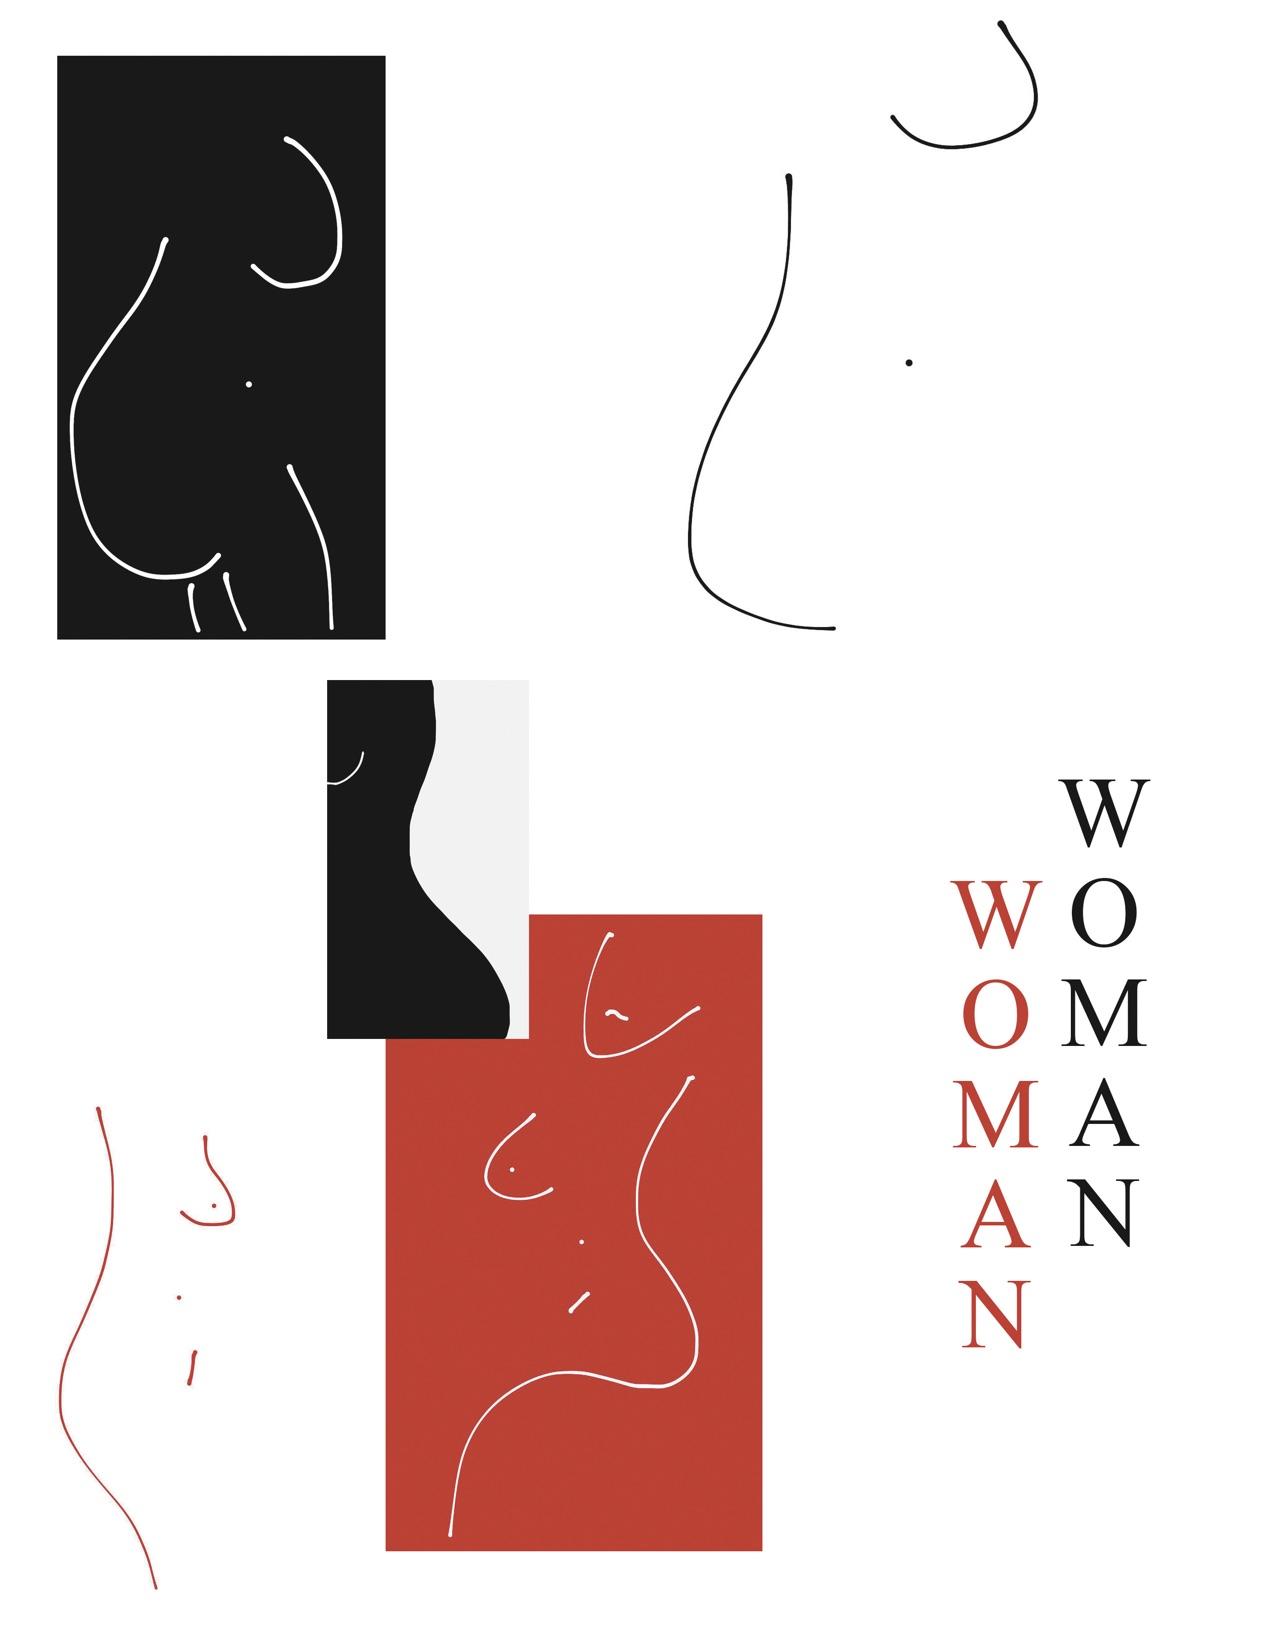 WomanWoman (1).jpg